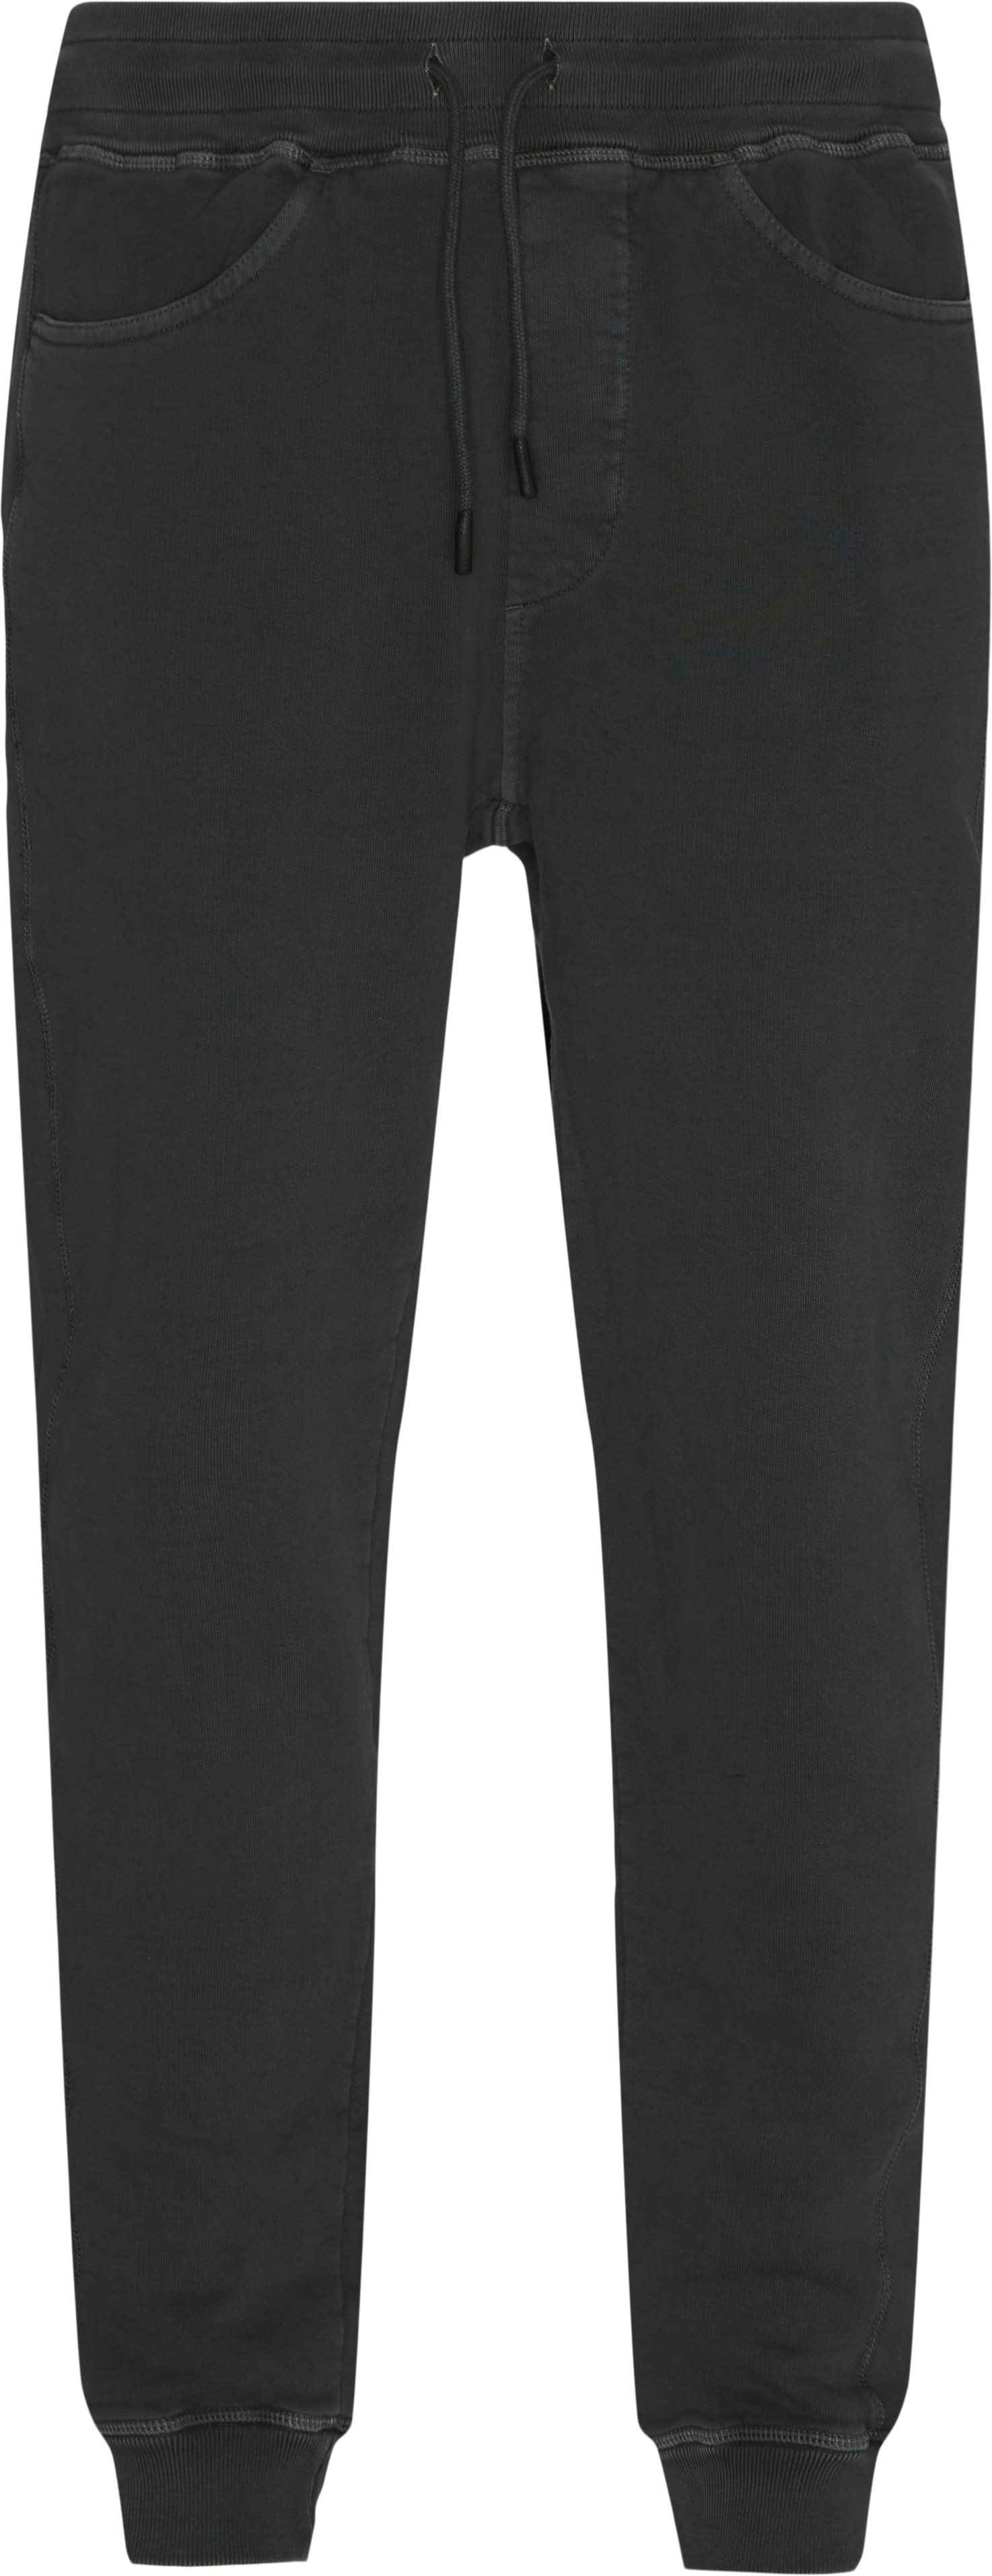 Sweatpants - Sweatshirts - Regular fit - Sort